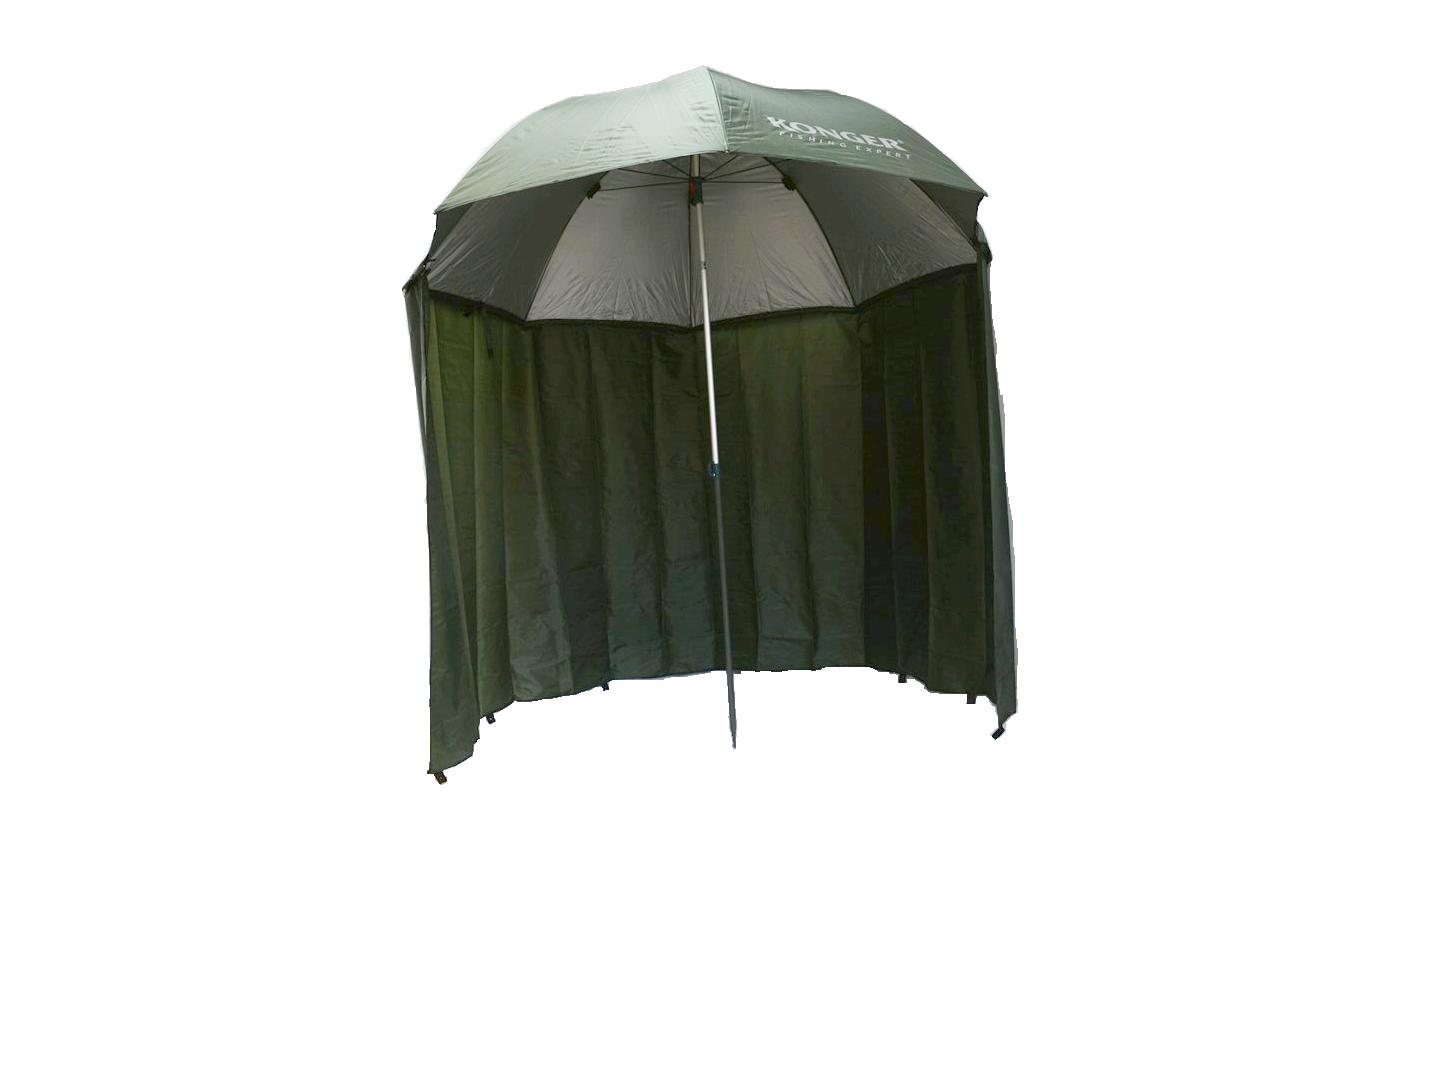 палатки для рыбалки зимой цены